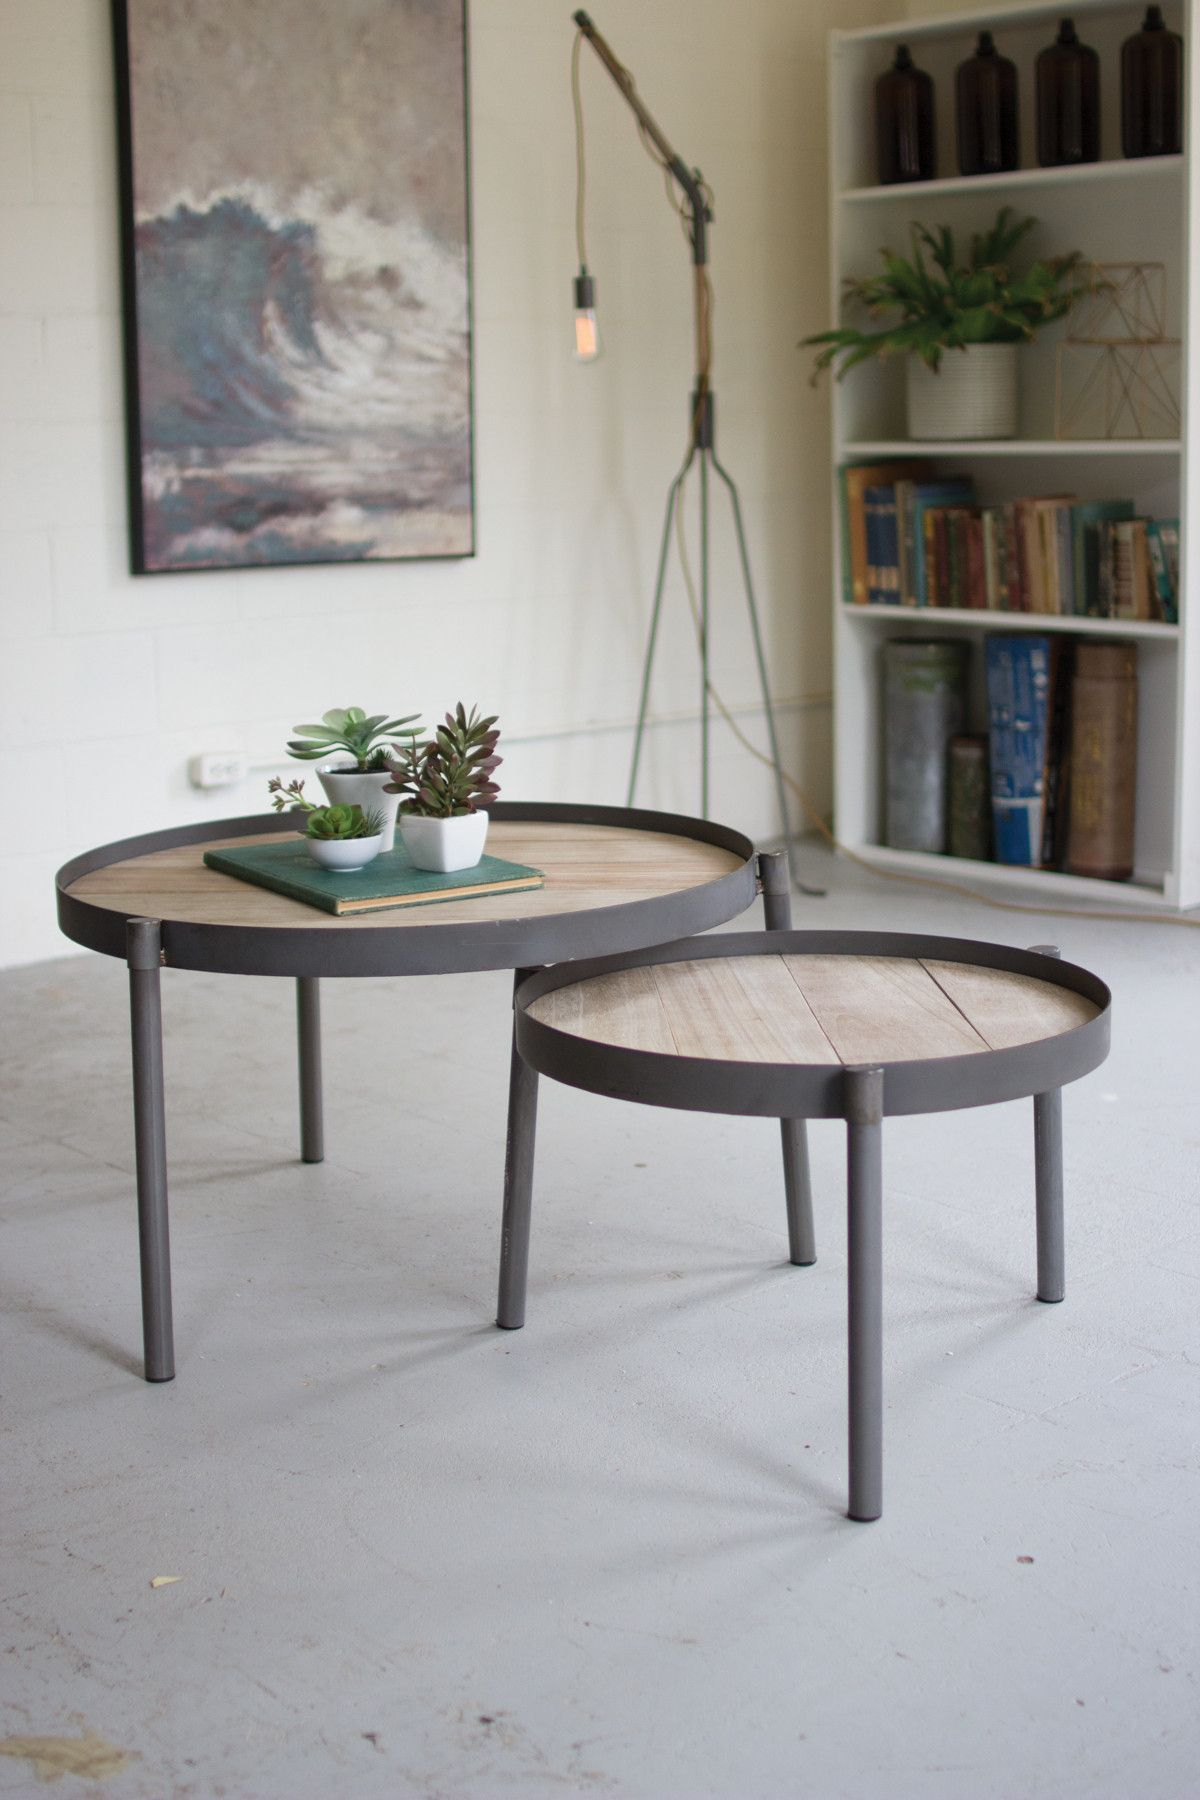 Numero 3 Iron Wood Nesting Coffee Tables Coffee Table Nesting Coffee Tables Coffee Table Design [ 1800 x 1200 Pixel ]